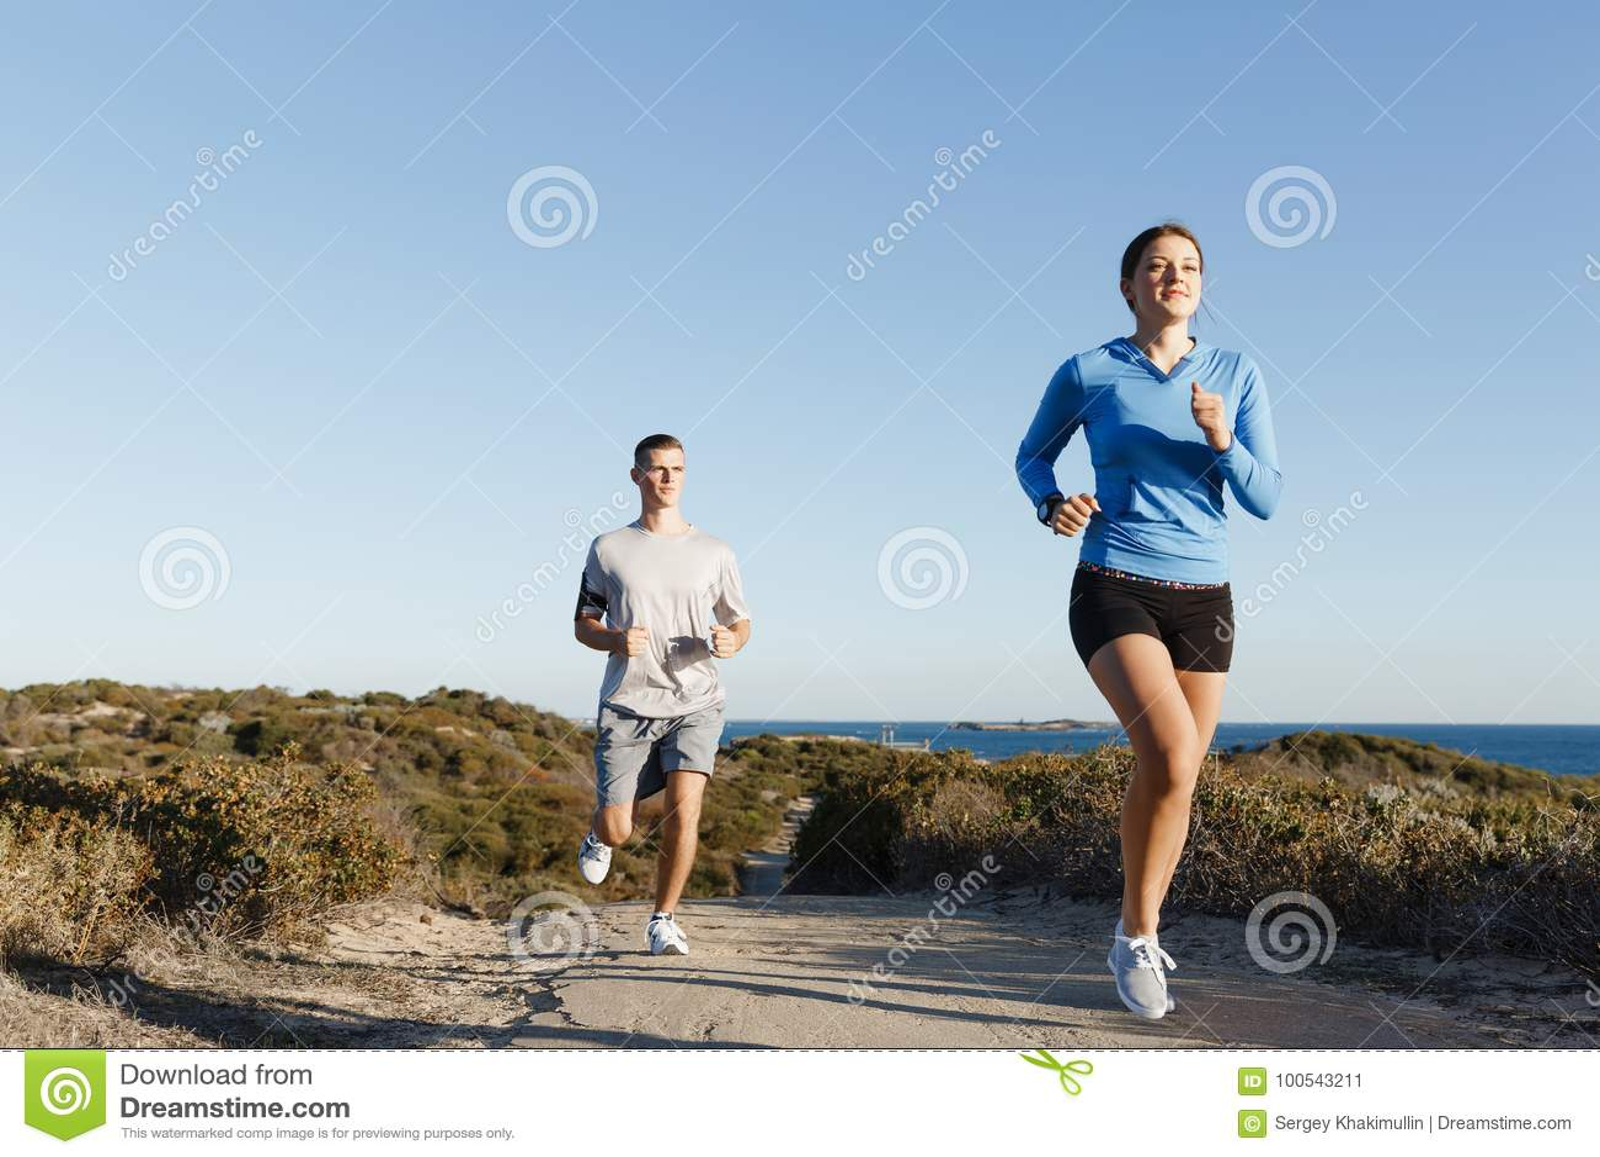 jogging partner